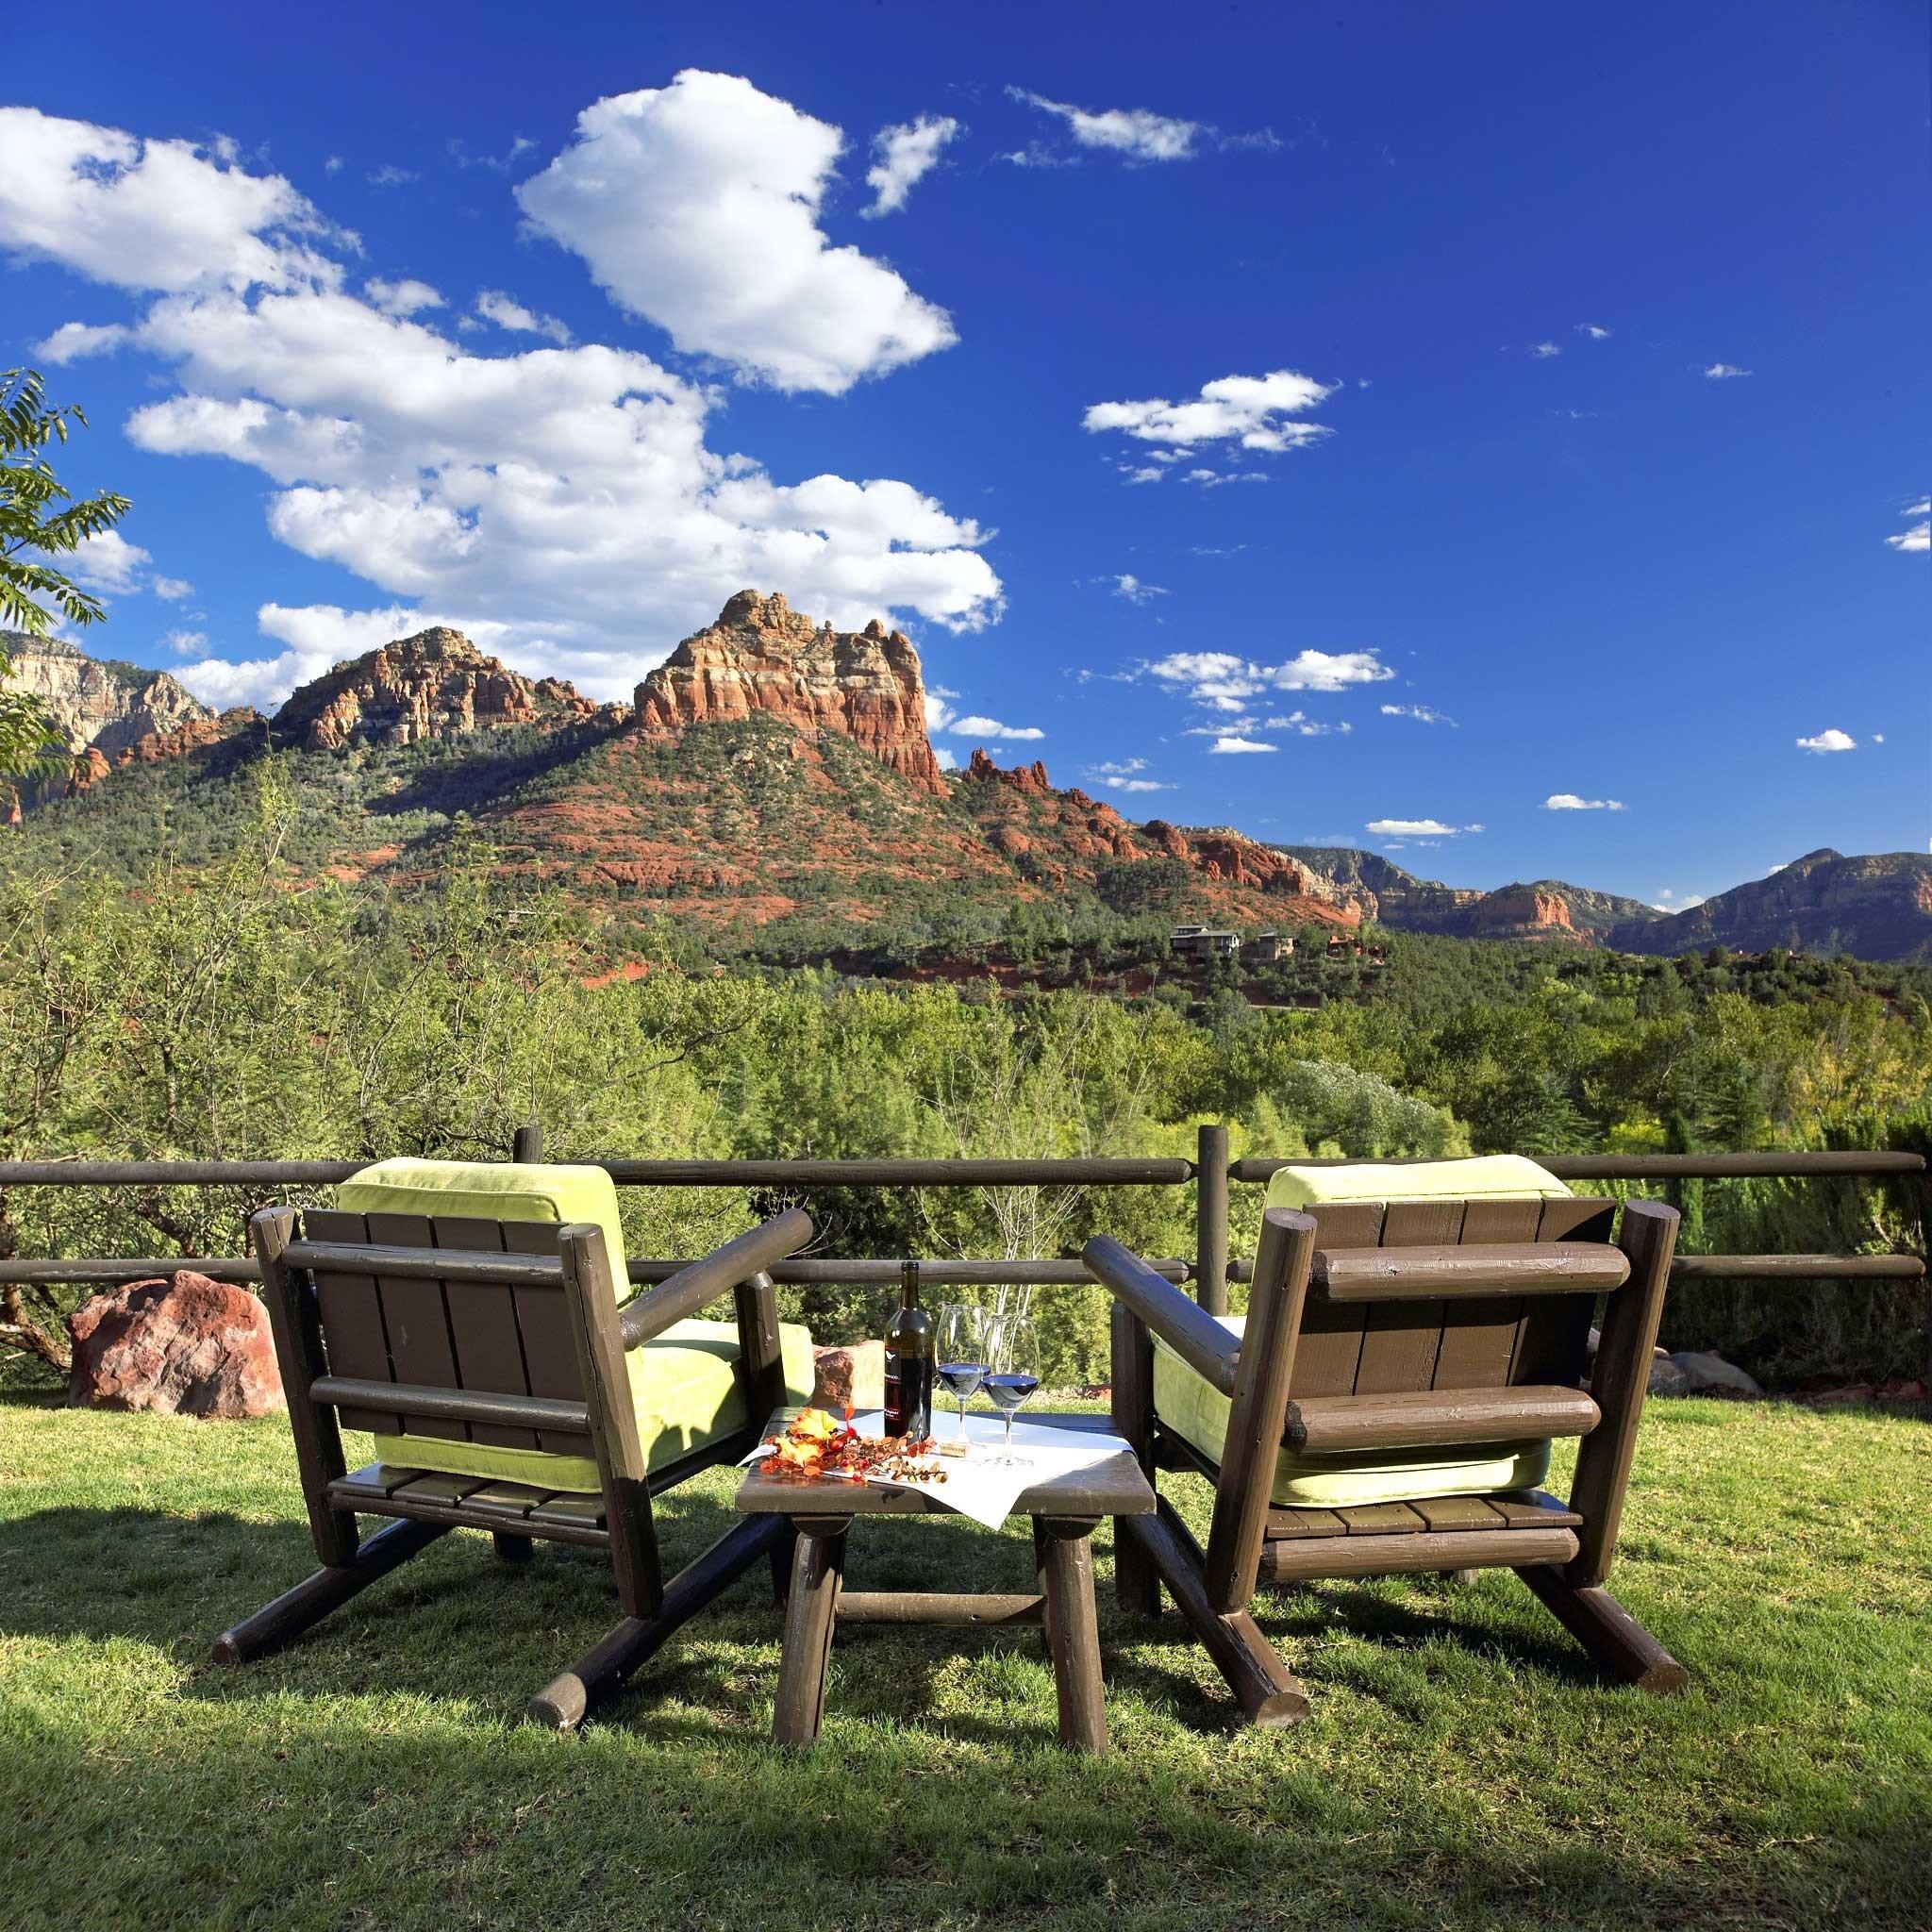 Exterior Mountains Outdoors Romance Romantic Scenic views Trip Ideas grass sky mountain meadow seat chair